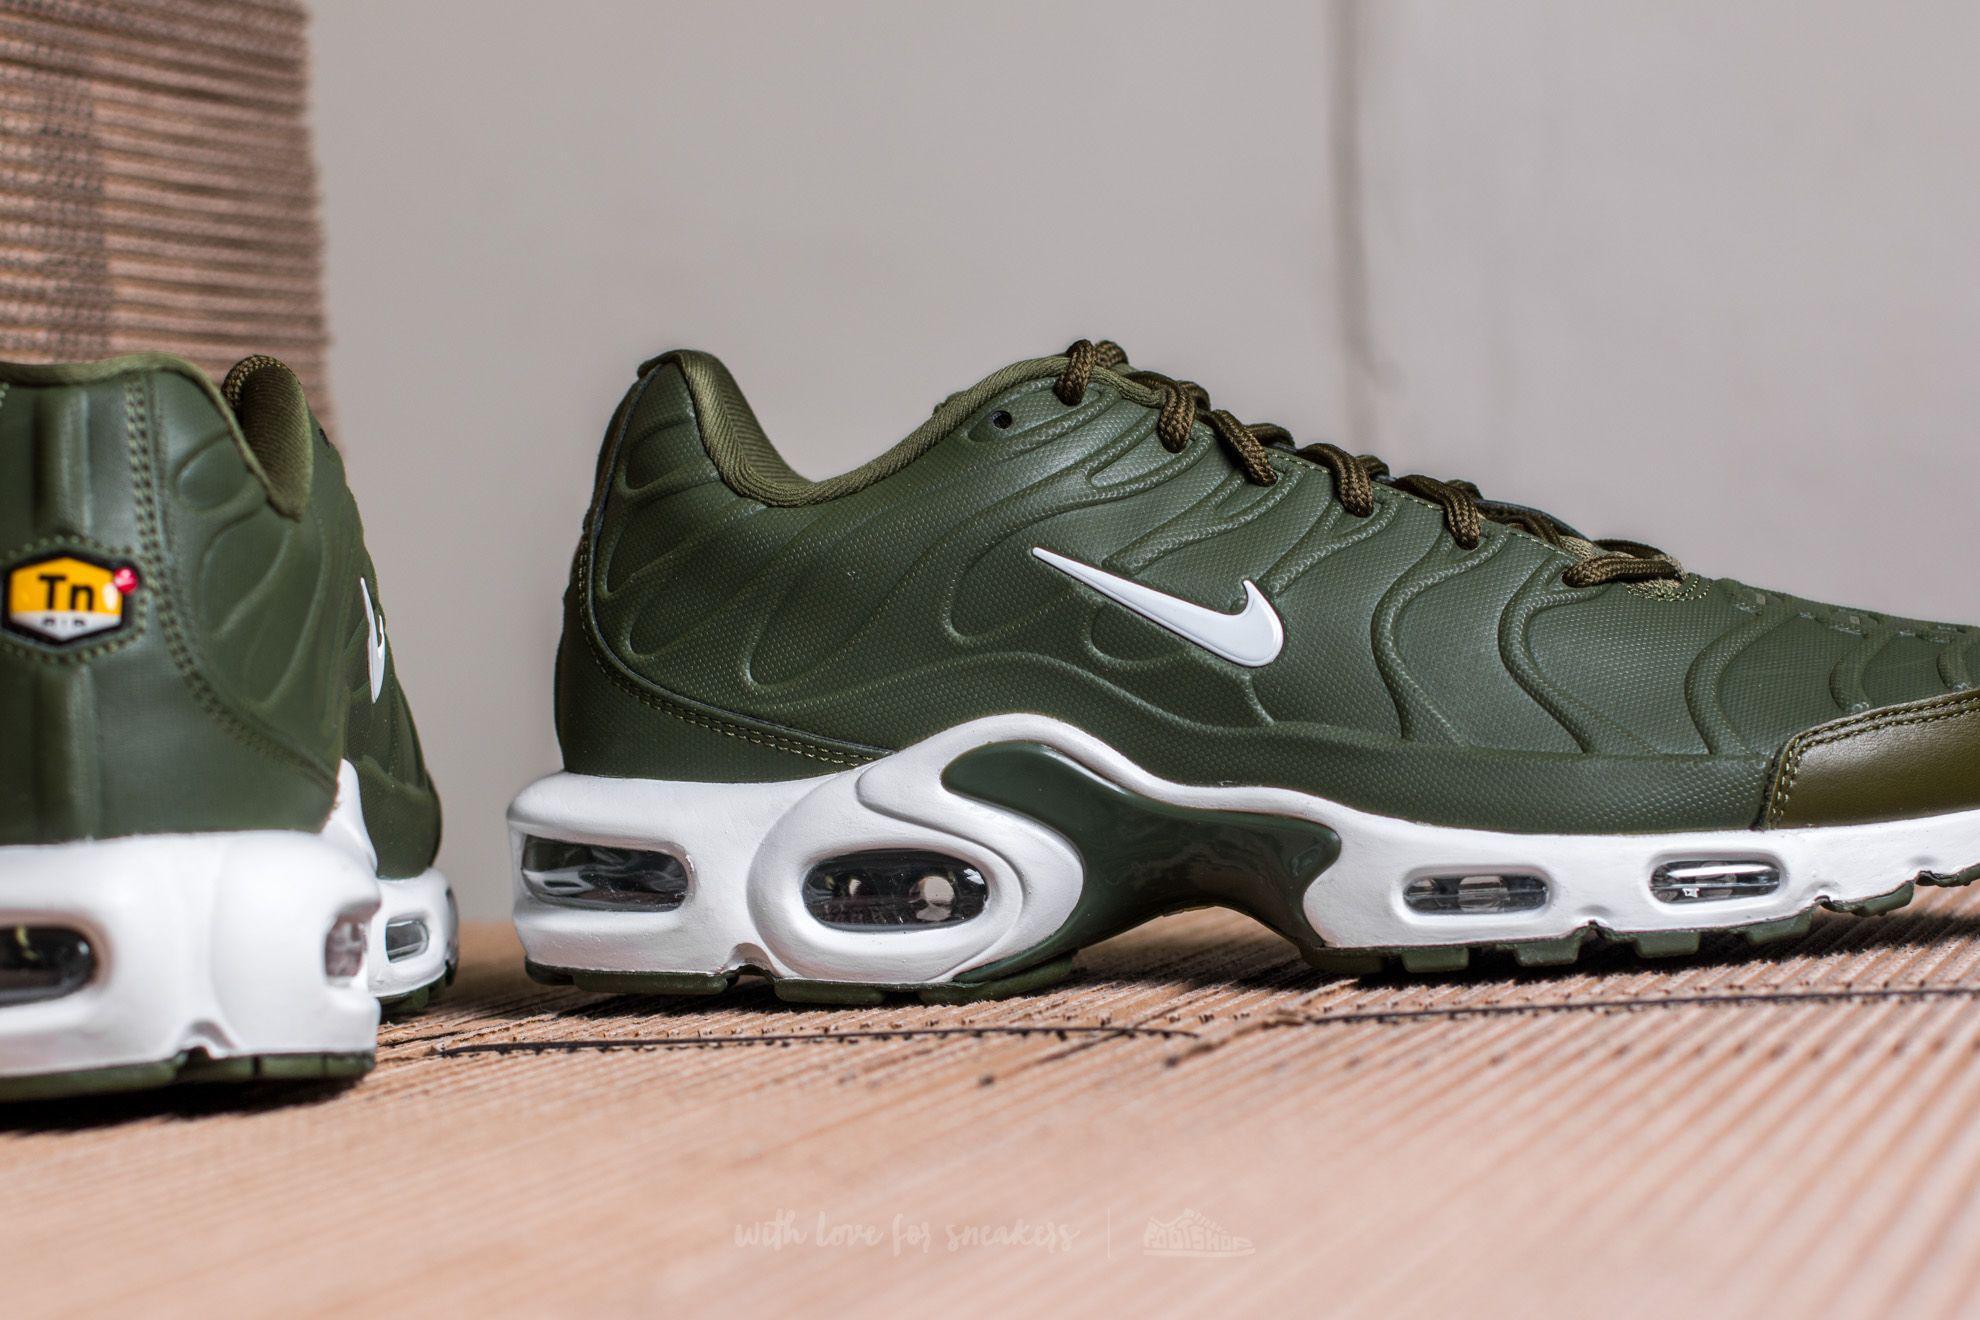 be5a9965174b Lyst - Nike Air Max Plus Vt Legion Green  White in Green for Men